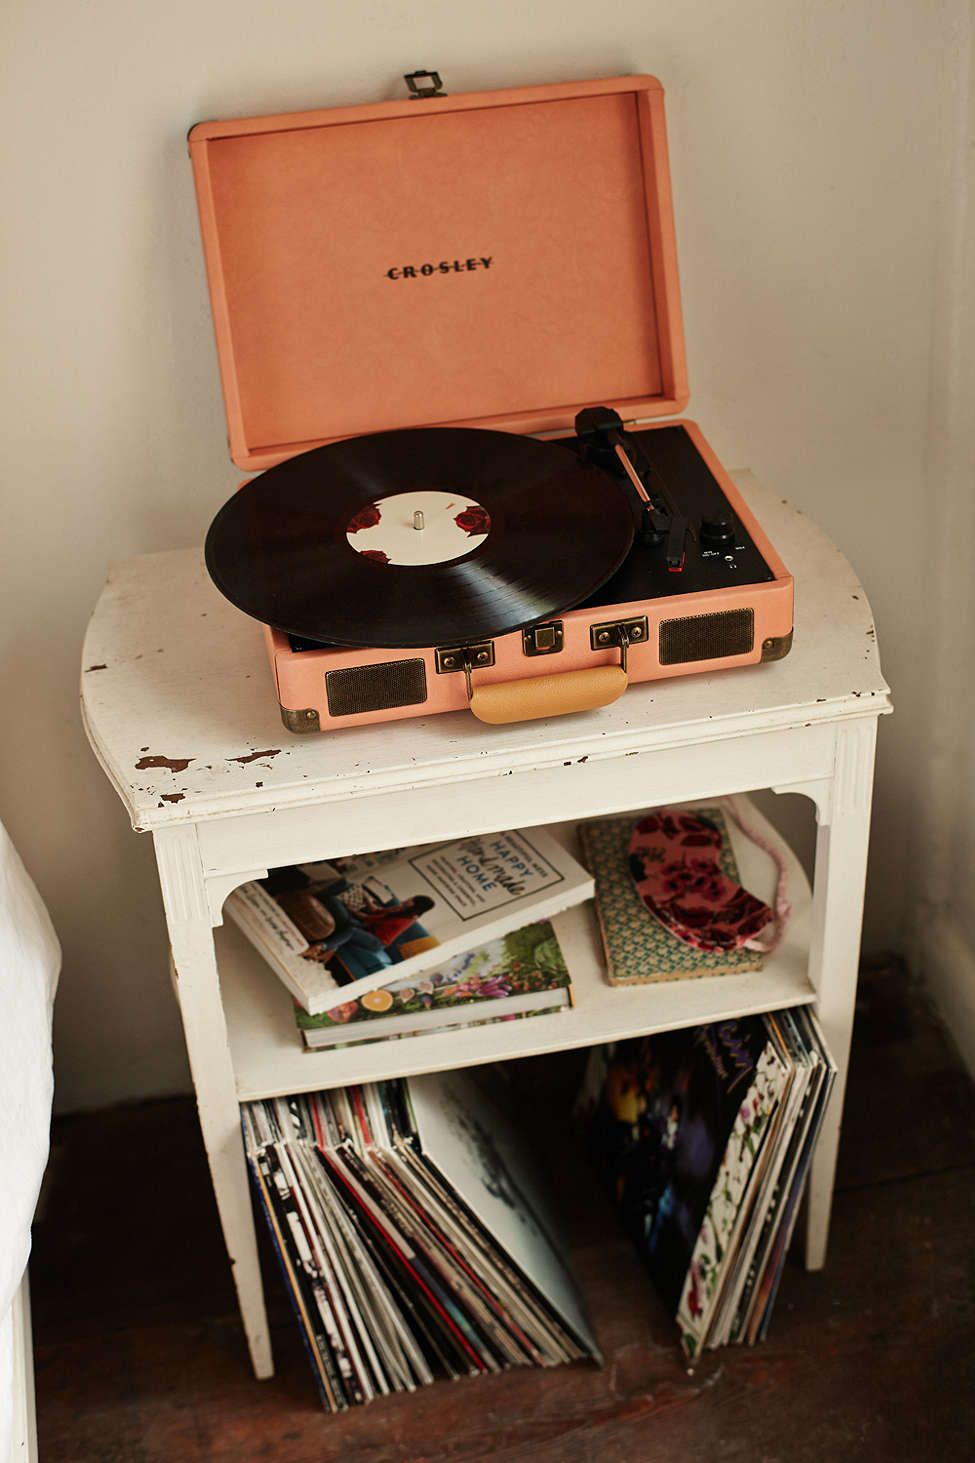 Crosley X Uo Cruiser Briefcase Portable Vinyl Record